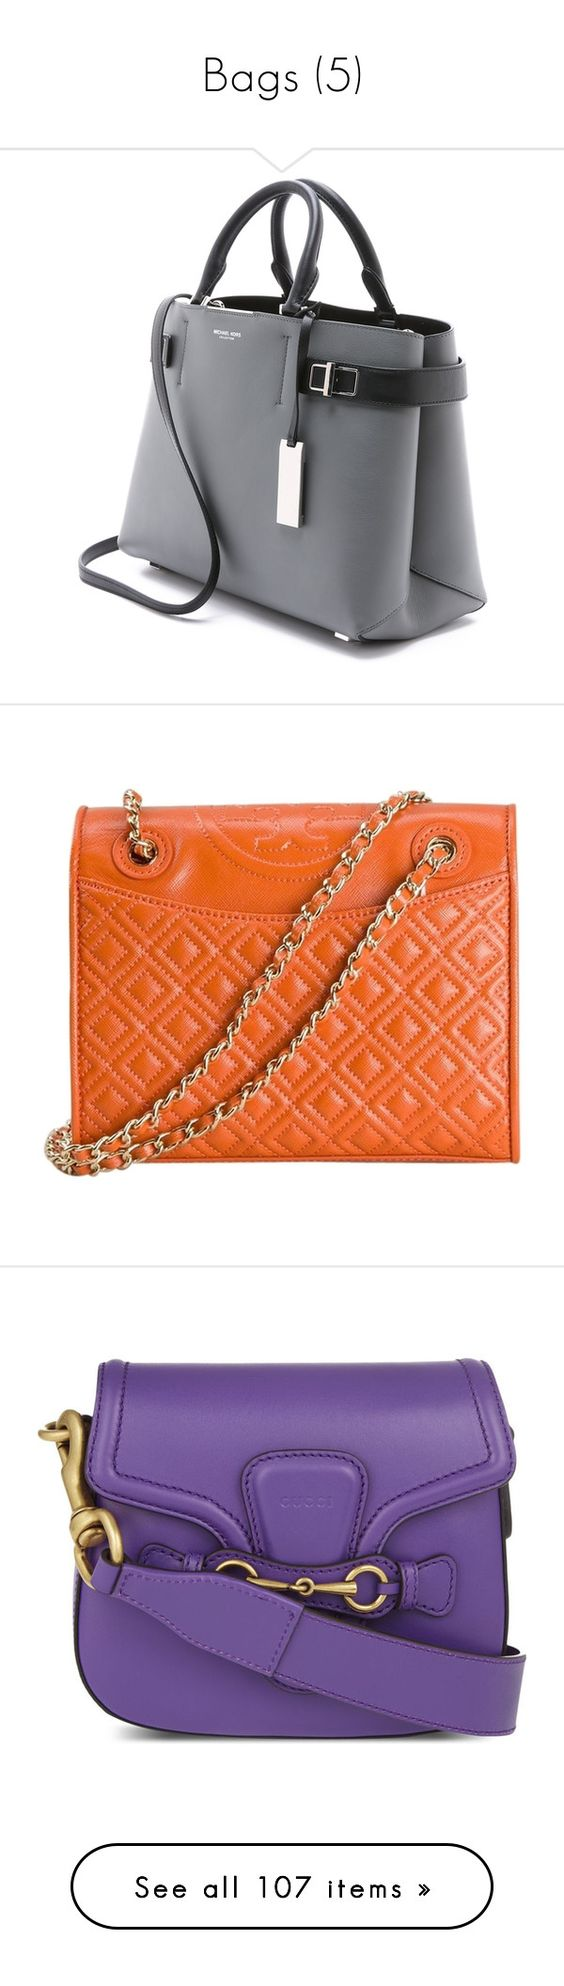 """Bags (5)"" by geniusmermaid ❤ liked on Polyvore featuring bags, handbags, bolsas, accessories, purses, handbag purse, genuine leather handbags, leather satchel purse, leather handbags and genuine leather purse"